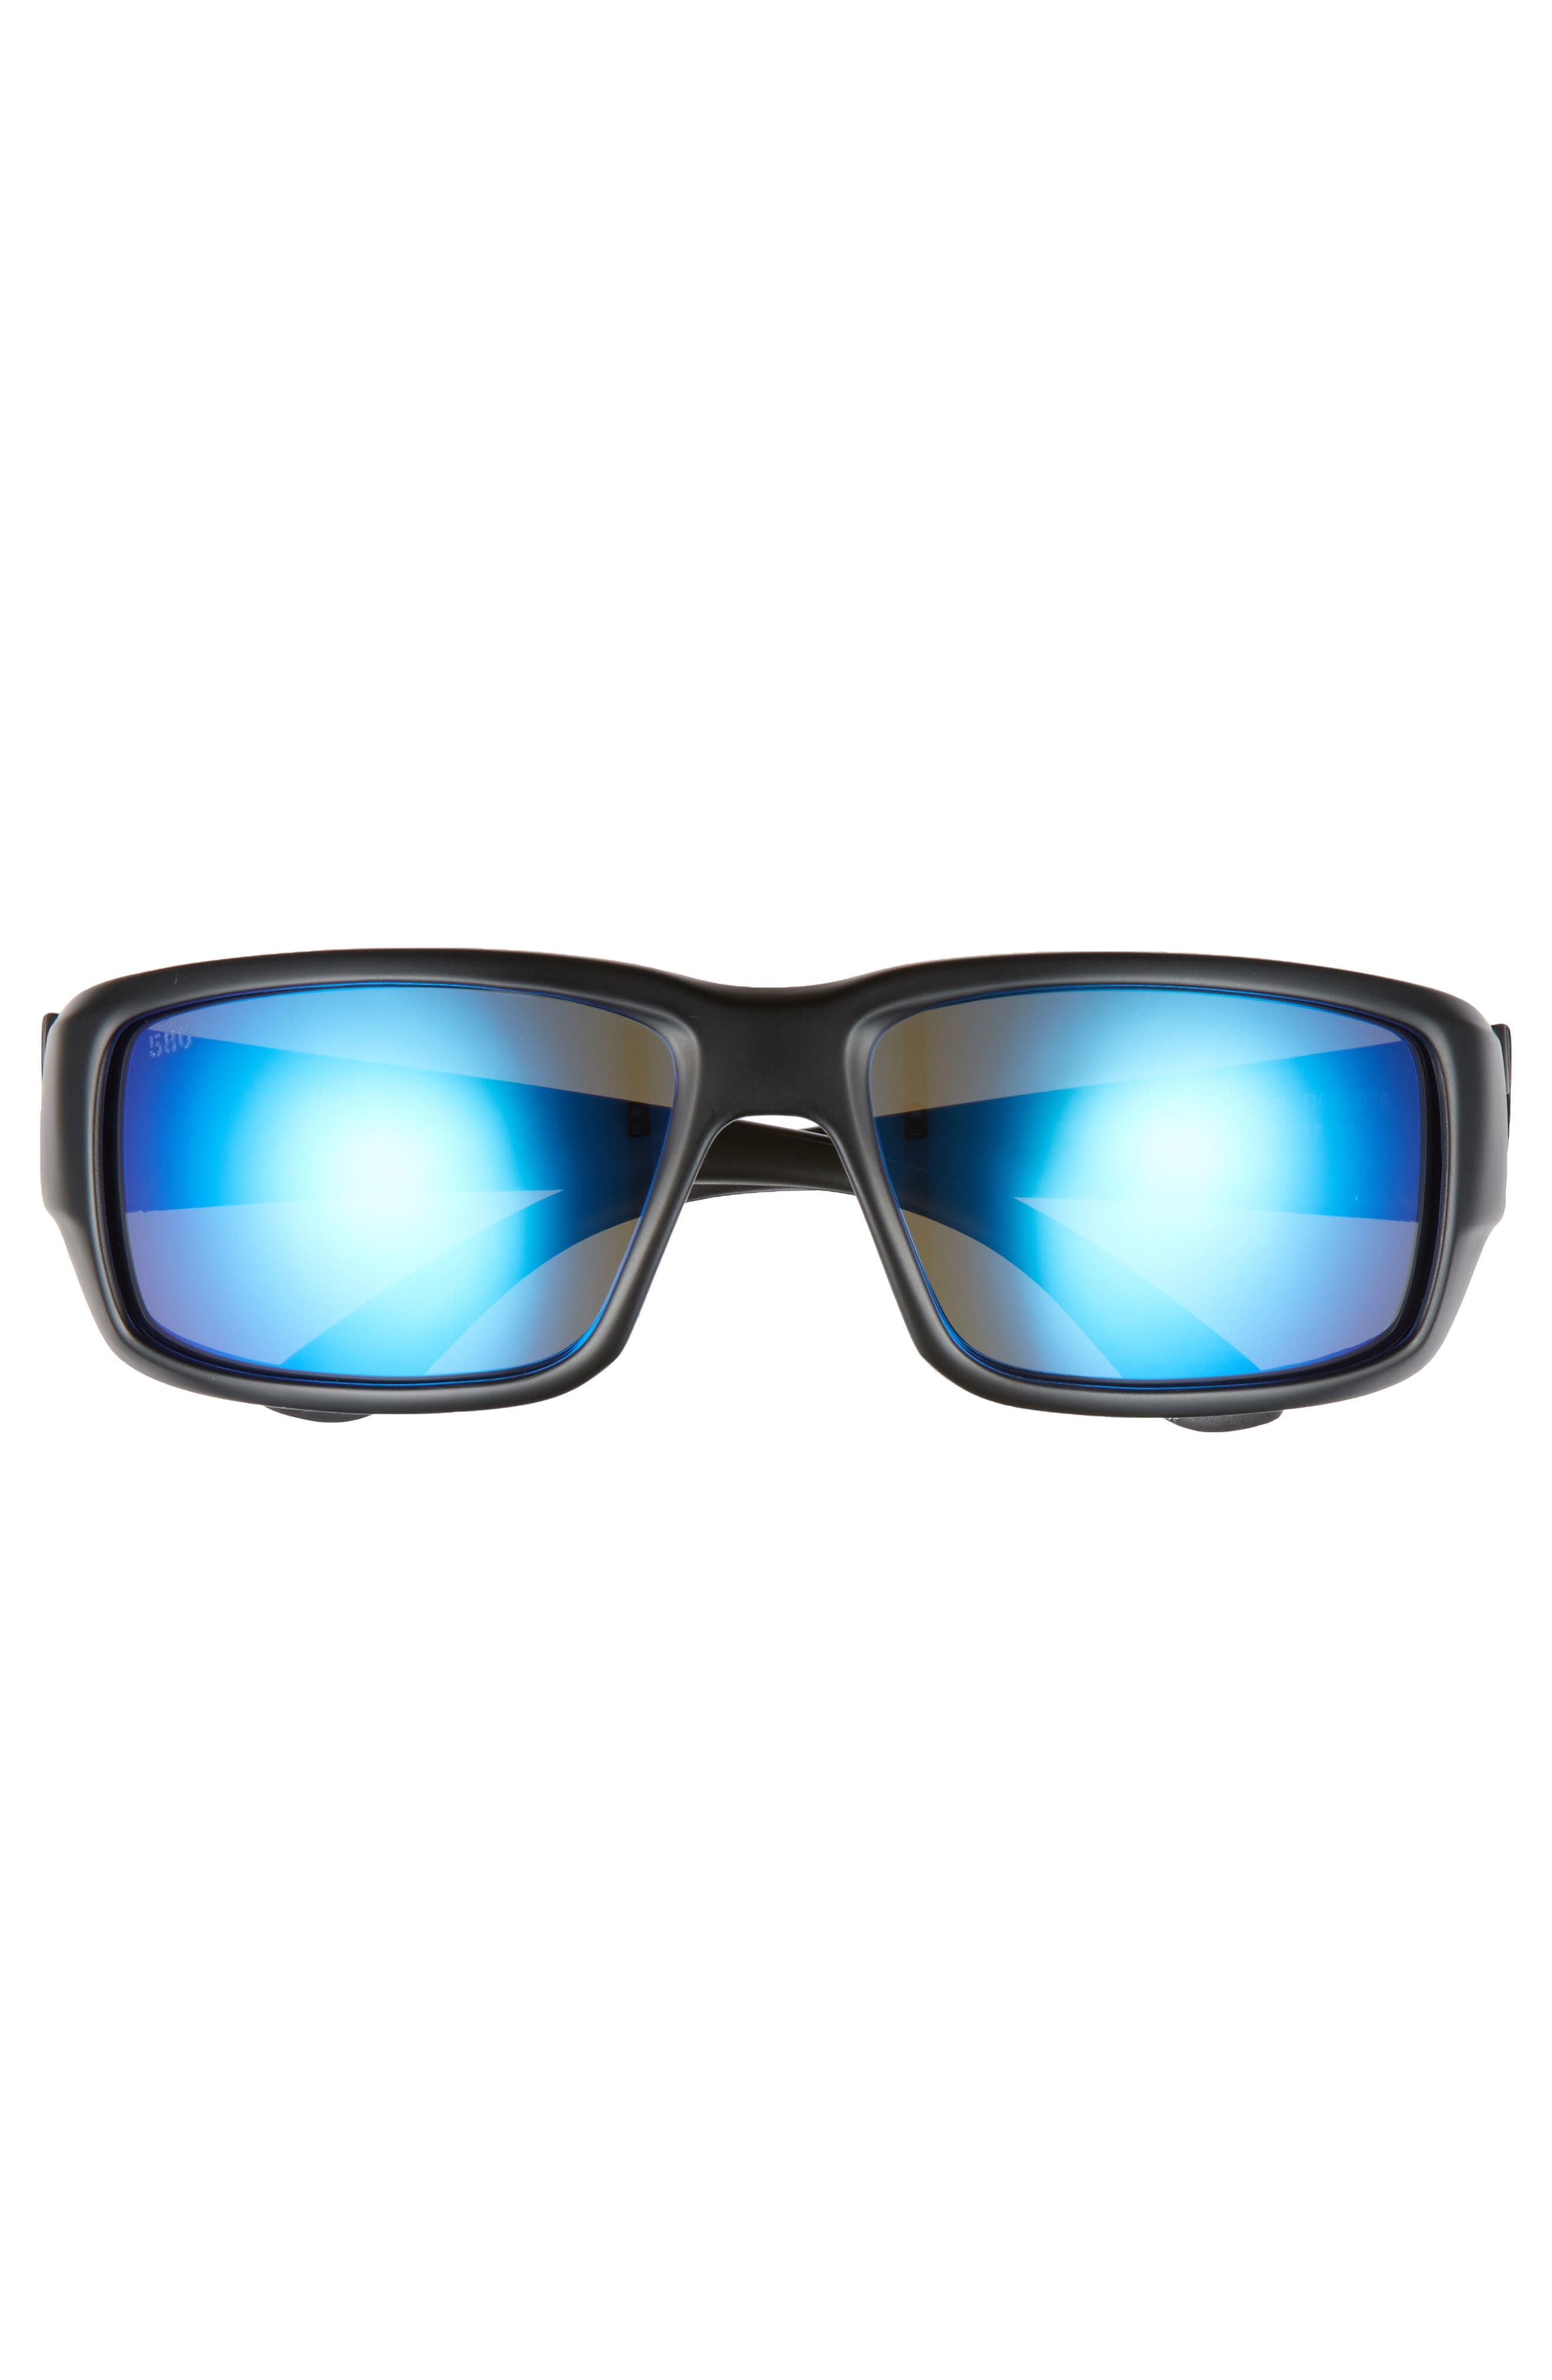 Fantail 60mm Polarized Sunglasses,                             Alternate thumbnail 2, color,                             BLACKOUT/ BLUE MIRROR